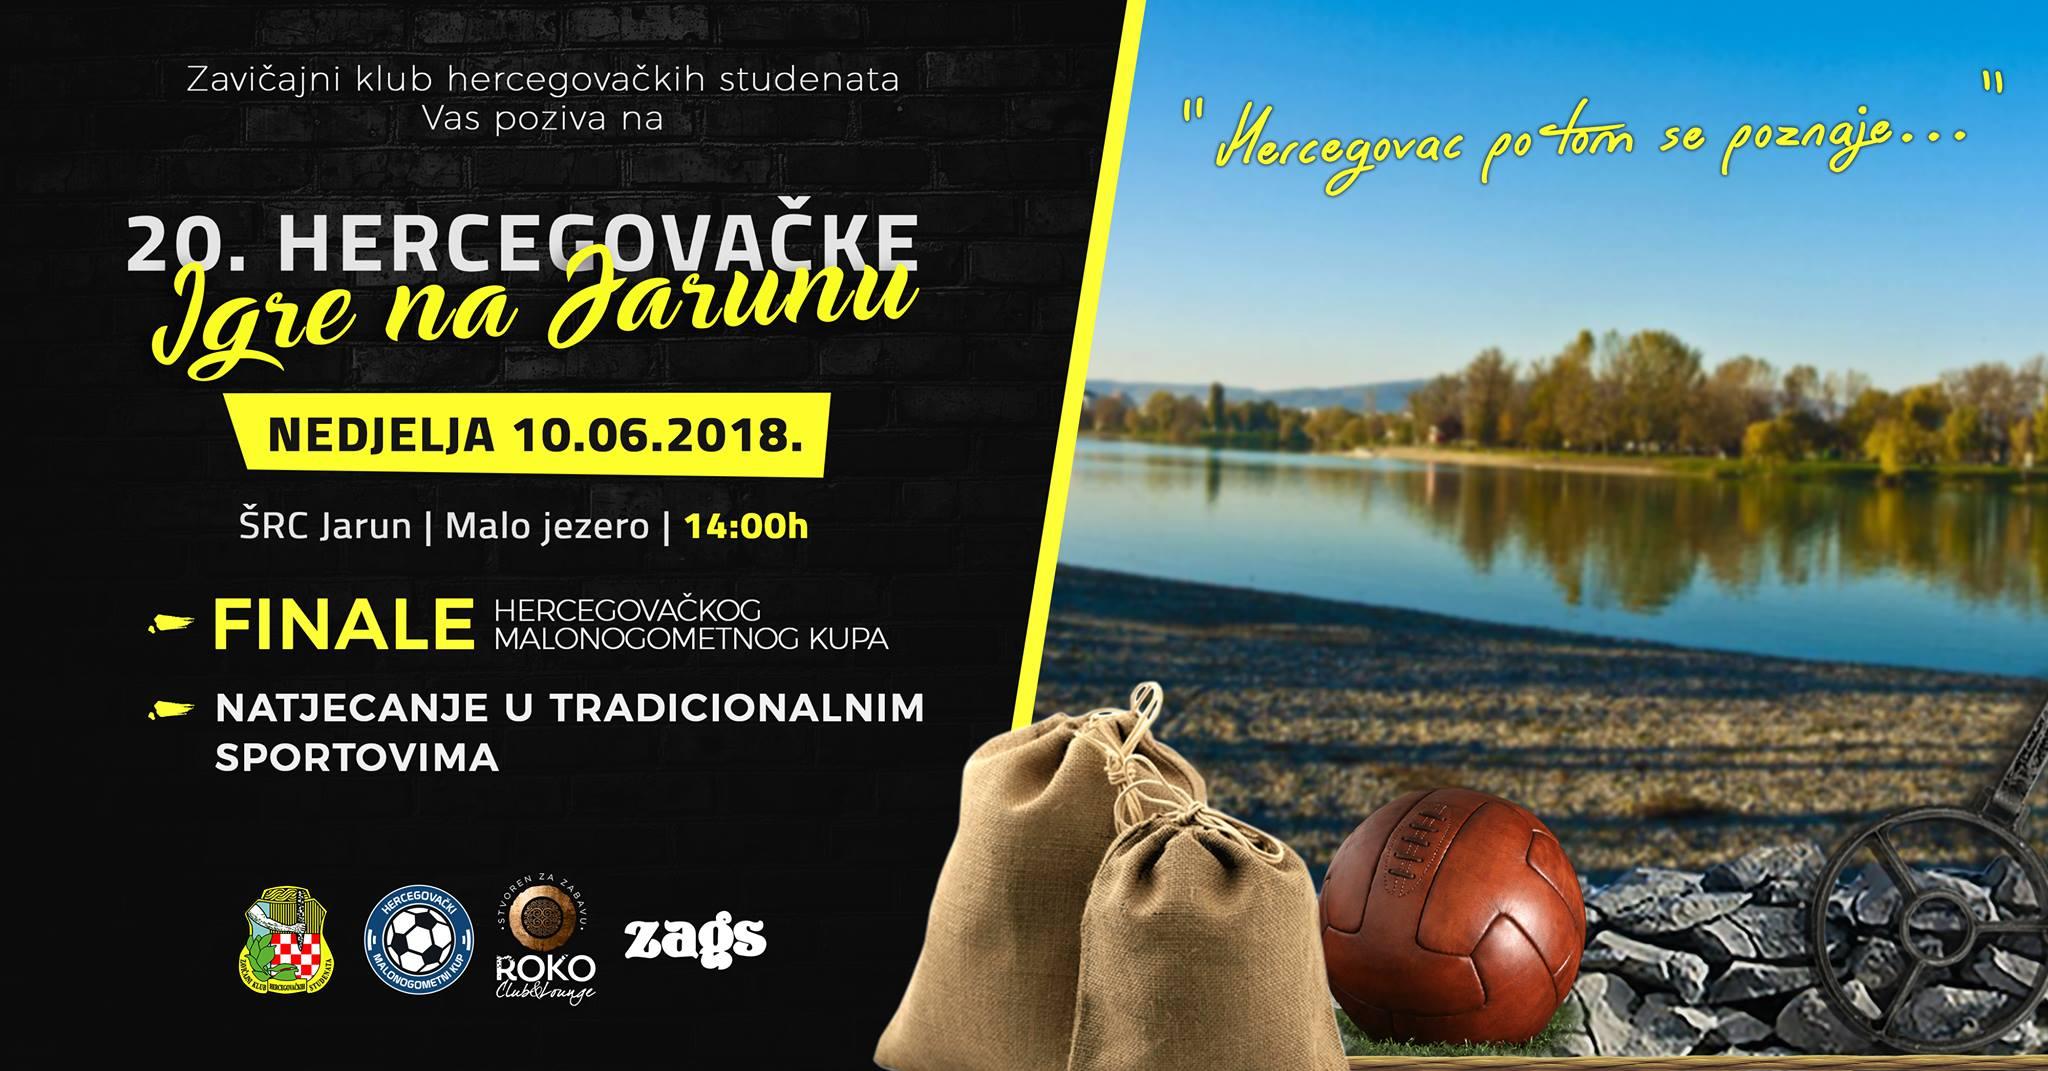 ZKHS organizira 20. po redu Hercegovačke igre na Jarunu